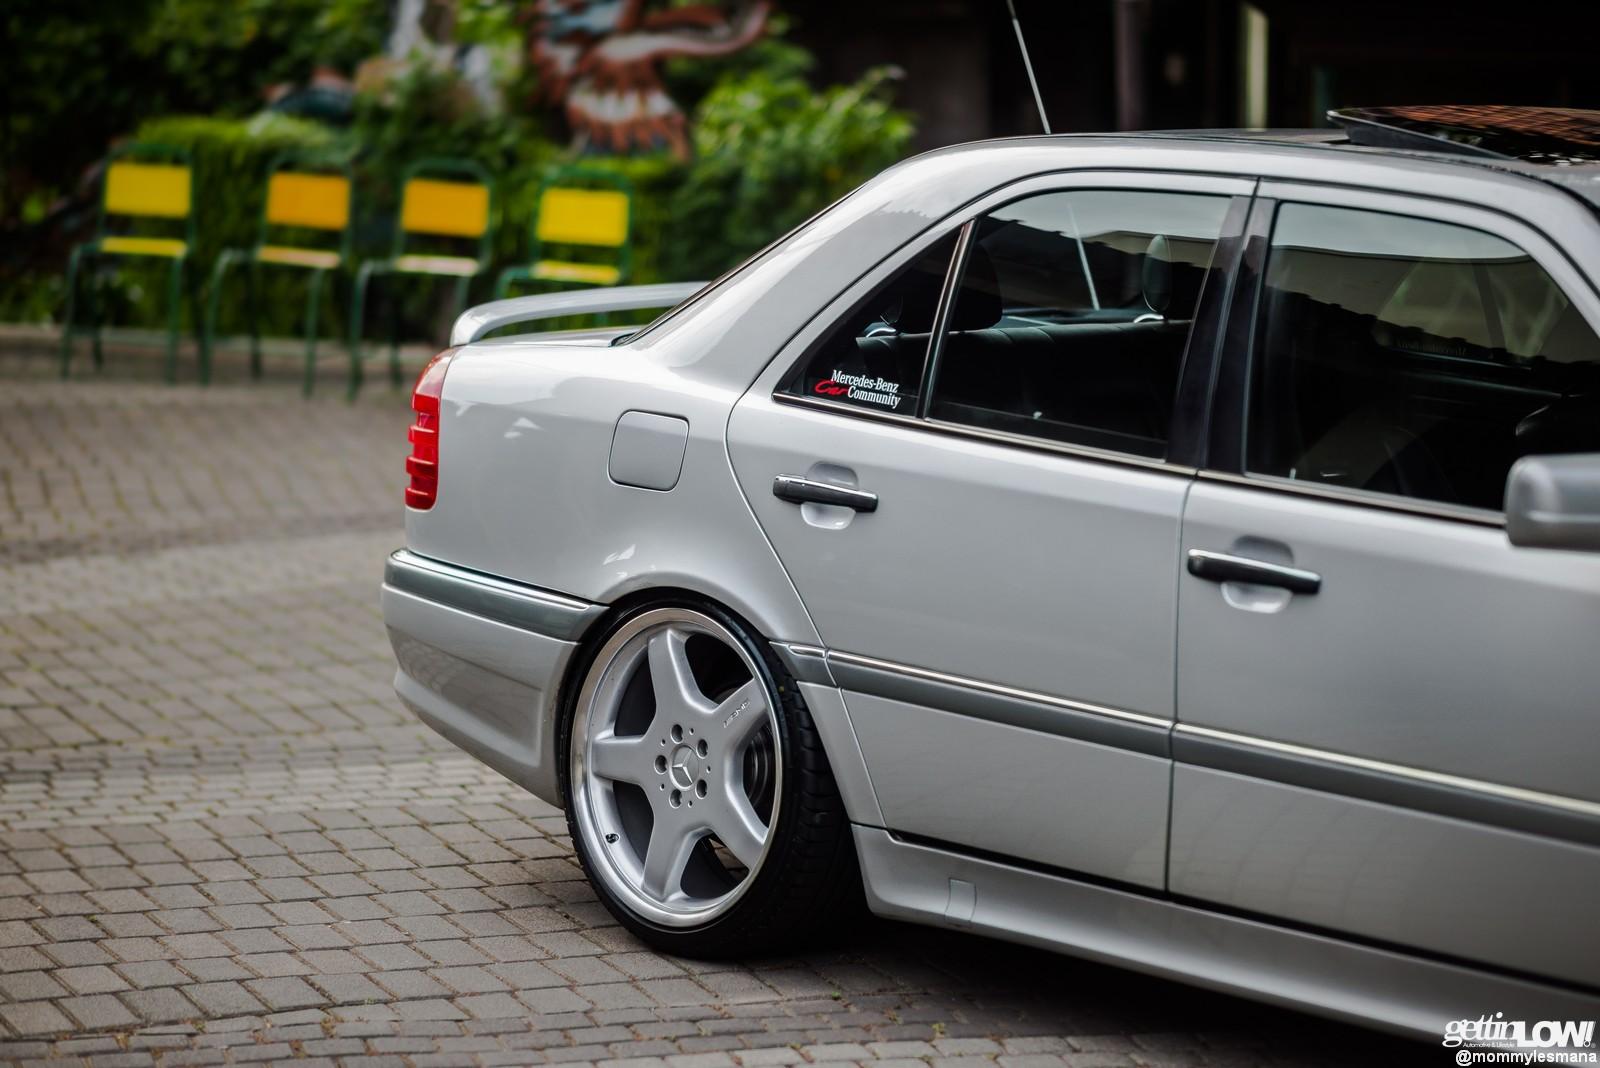 Trey's Mercedes-Benz W202